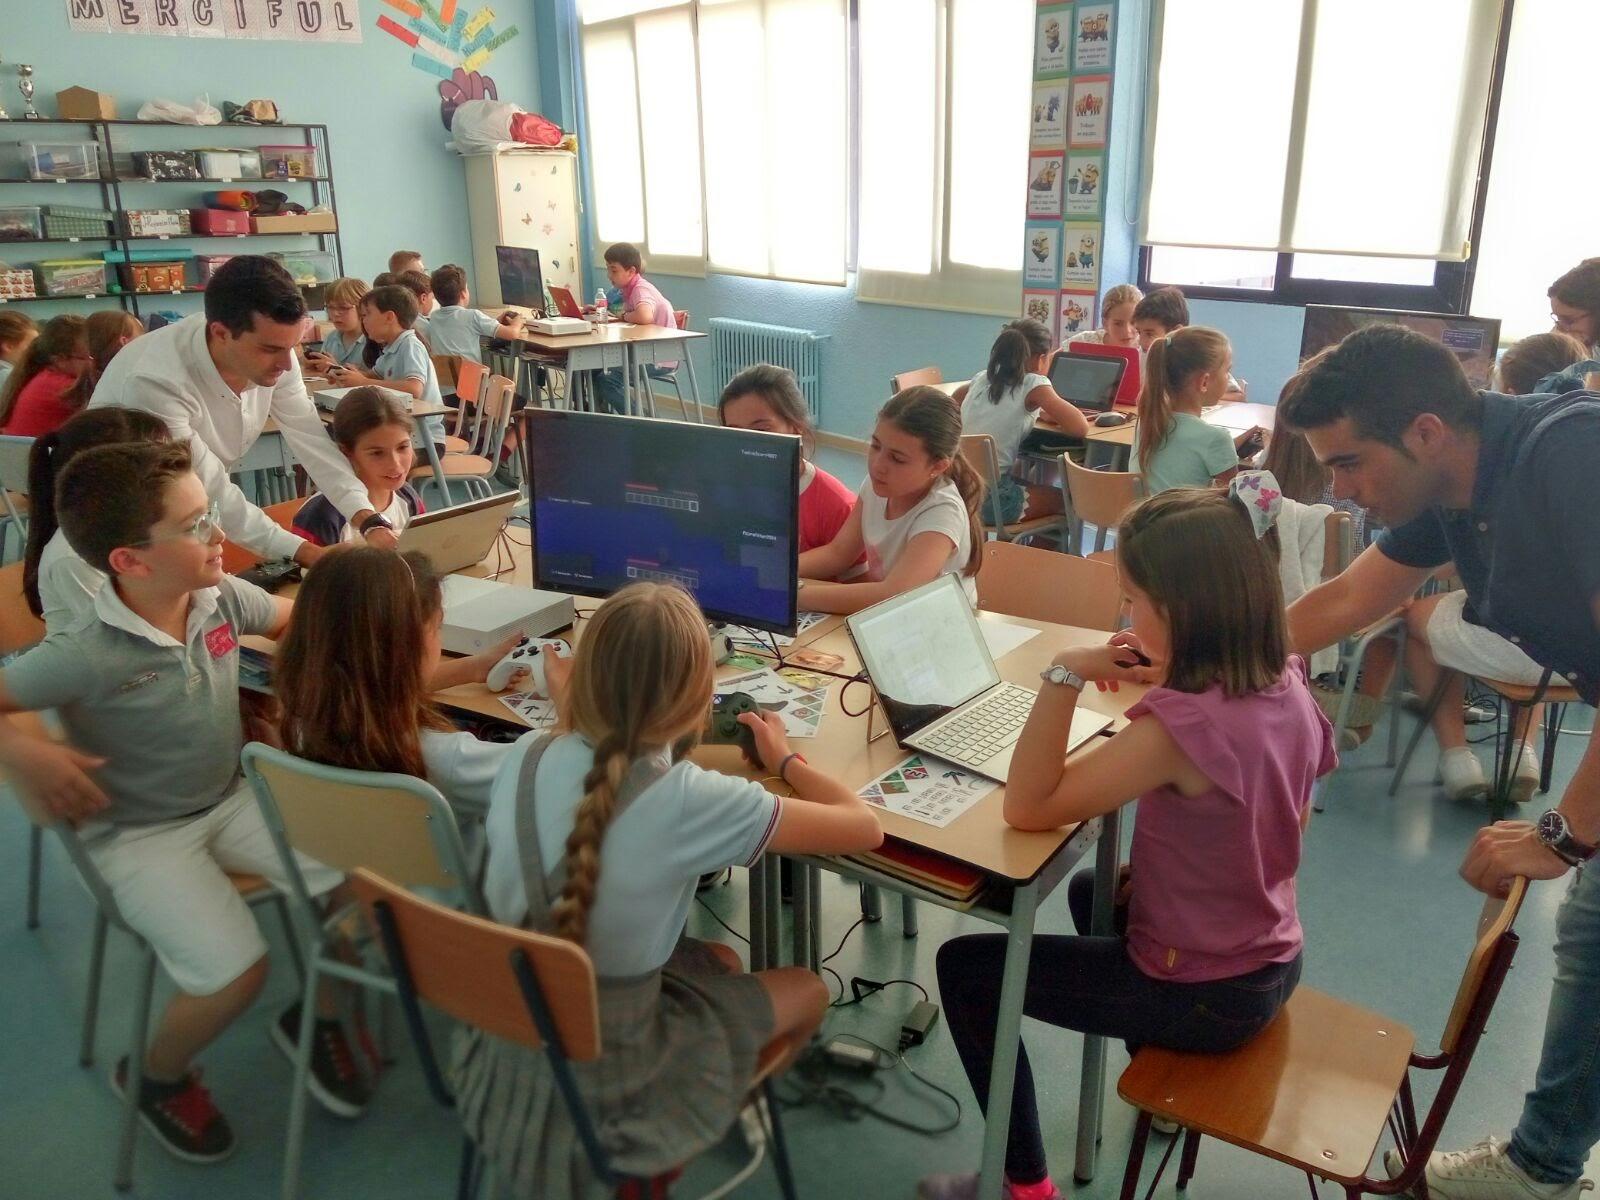 Colegio San Agustin Valladolid Minecraft 01